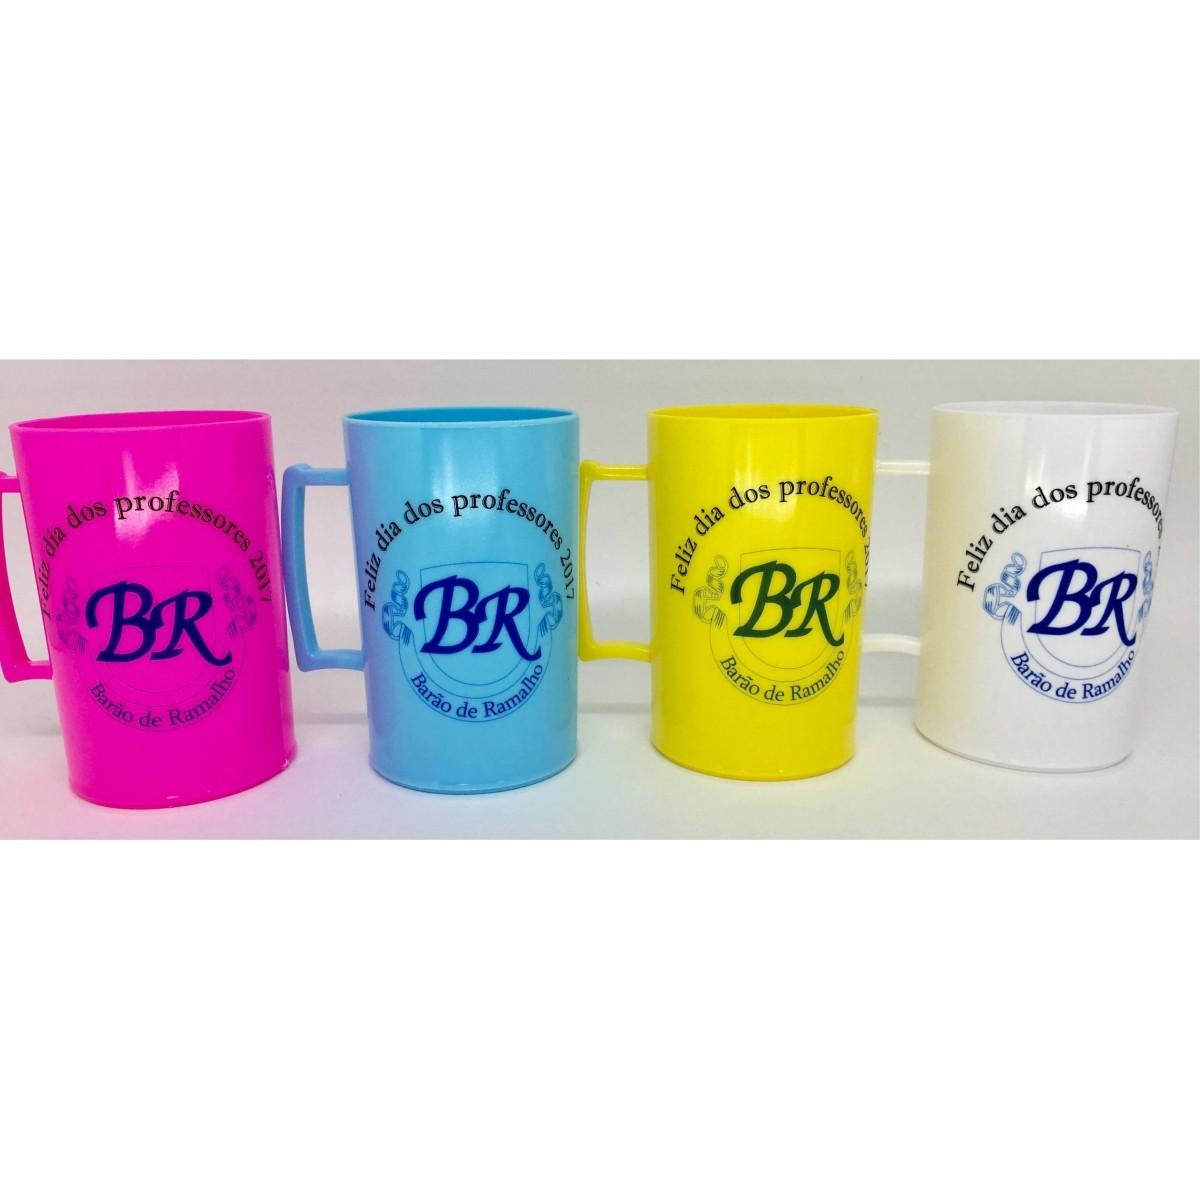 Caneca Acrílica Colorida Personalizada - Kit 20 unidades  - Bolas Lassabia - Bolas e Brindes Personalizados